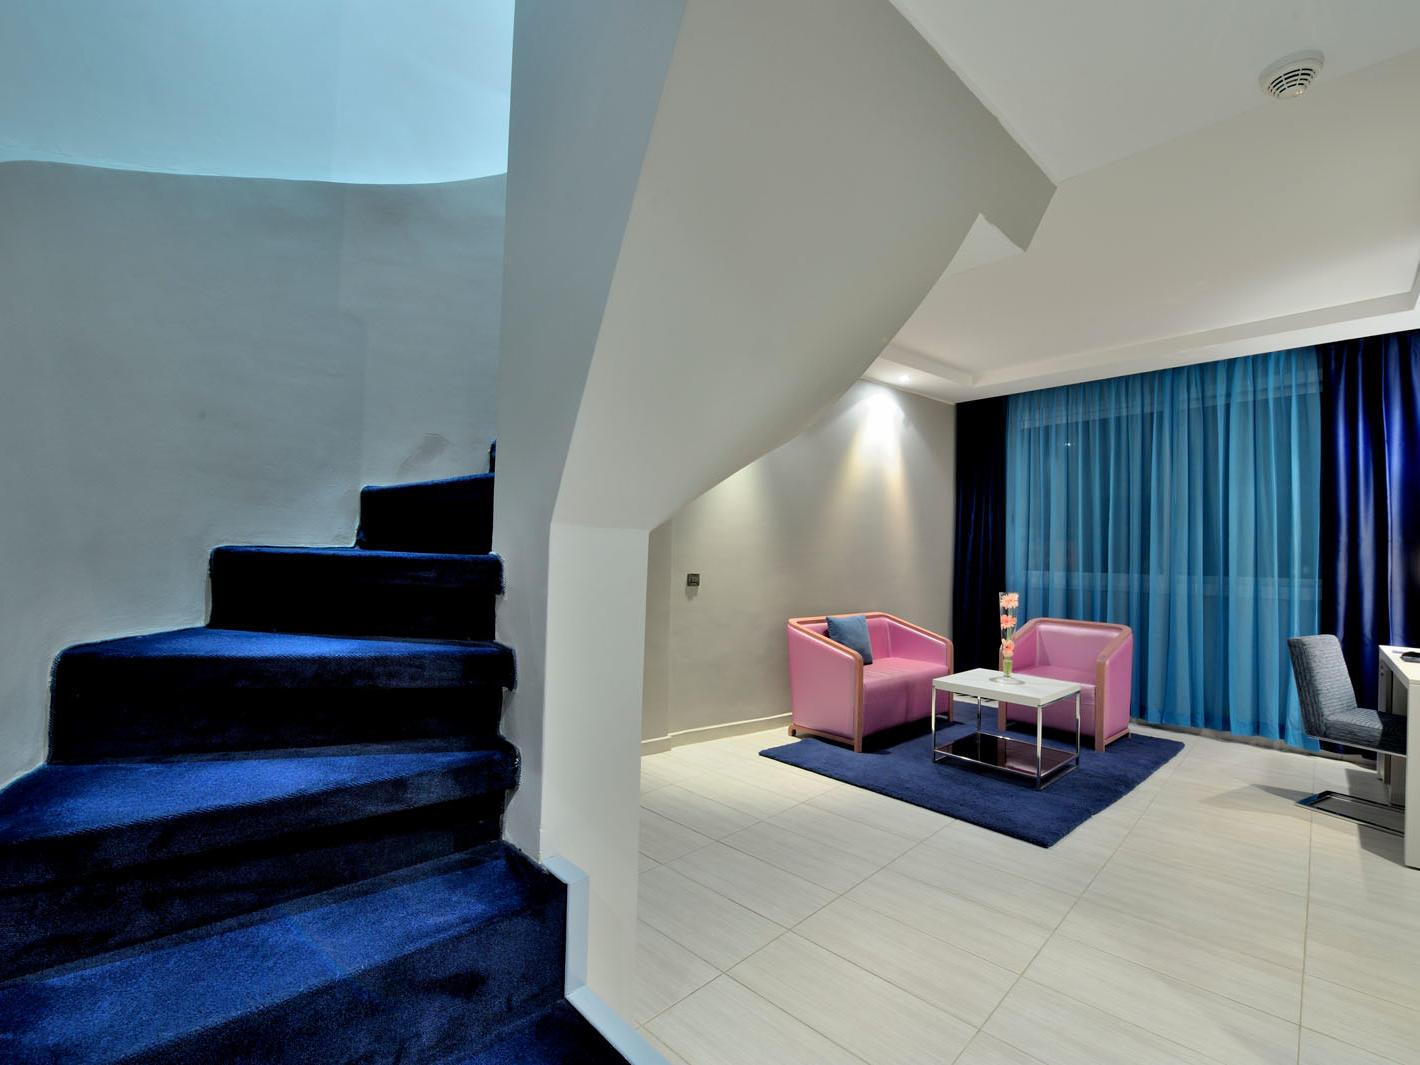 Duplex at Kenzi Solazur Hotel in Tangier, Morocco